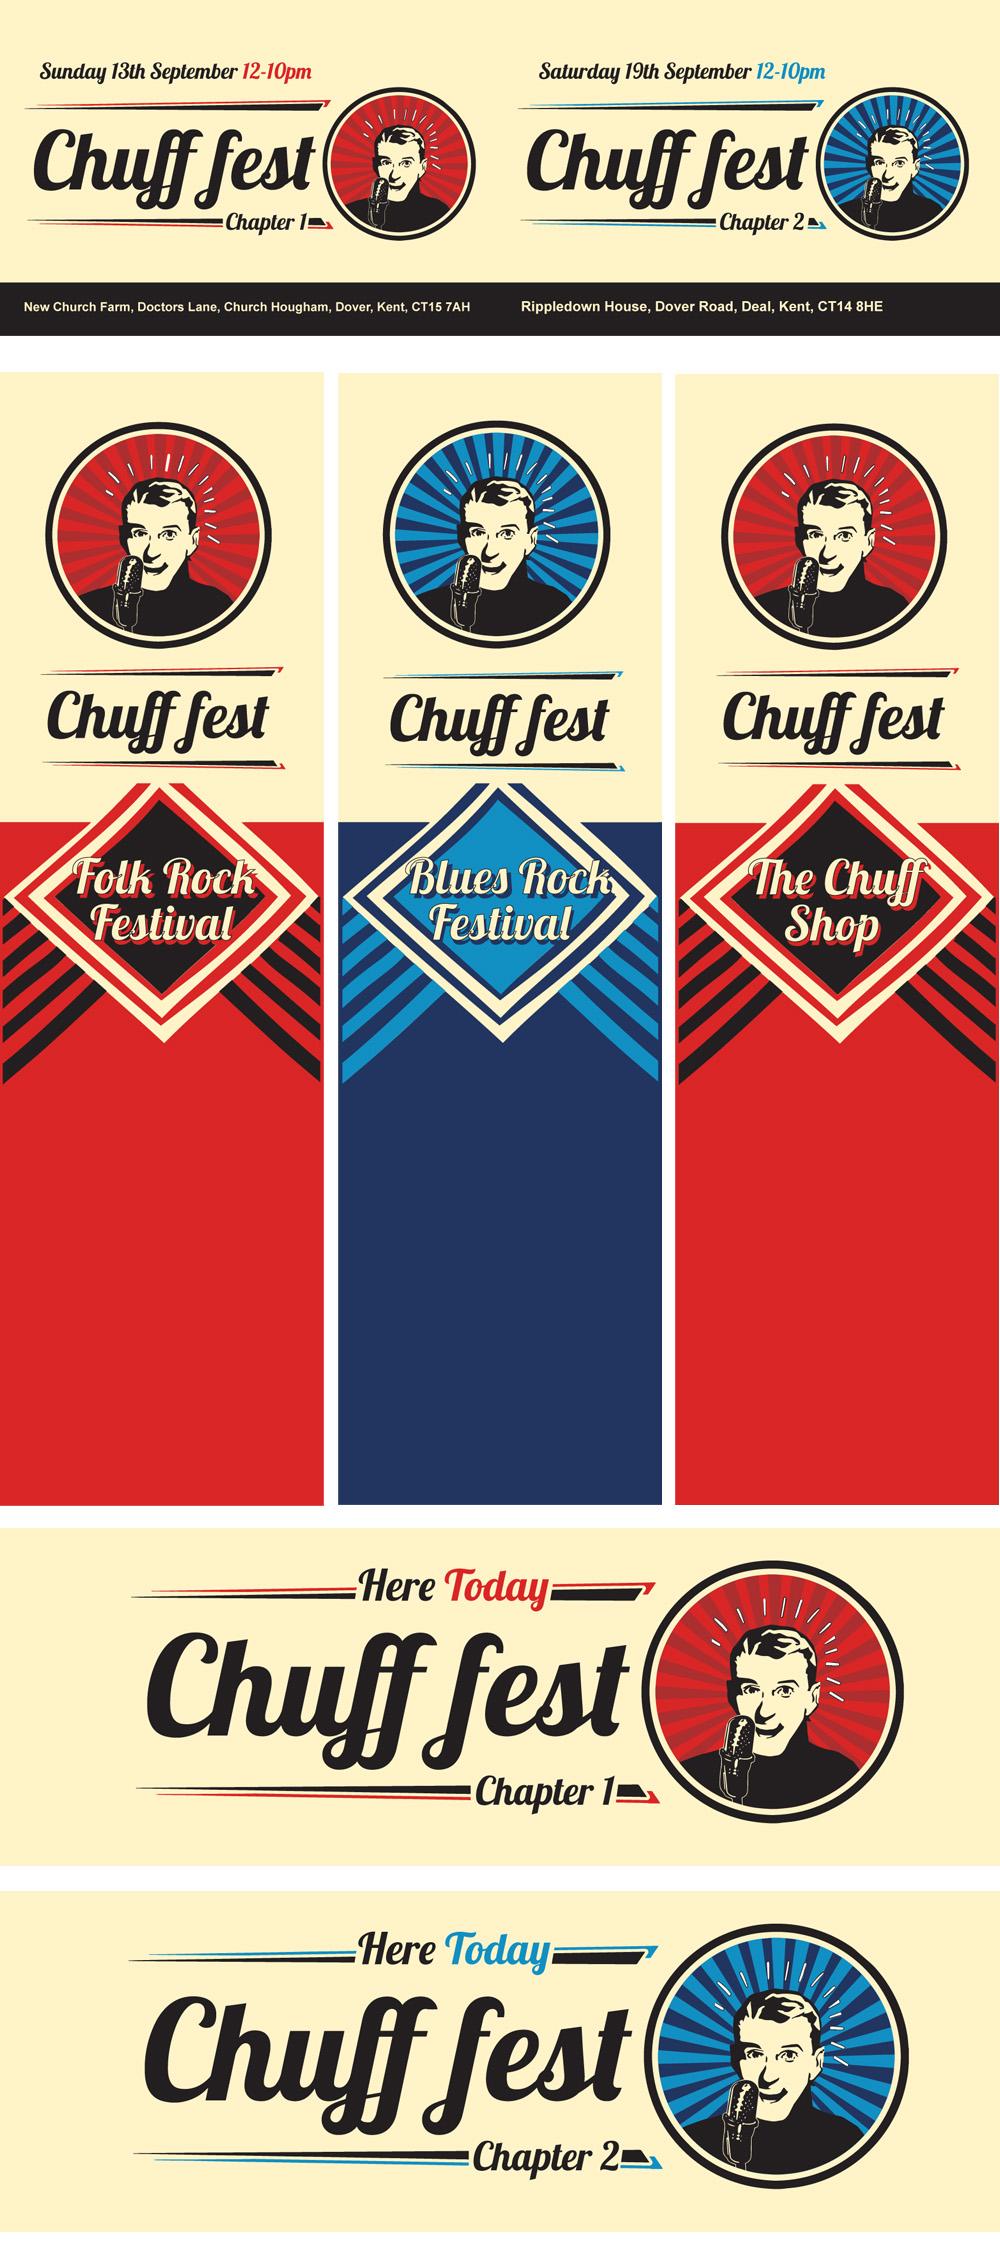 chuff fest-banners